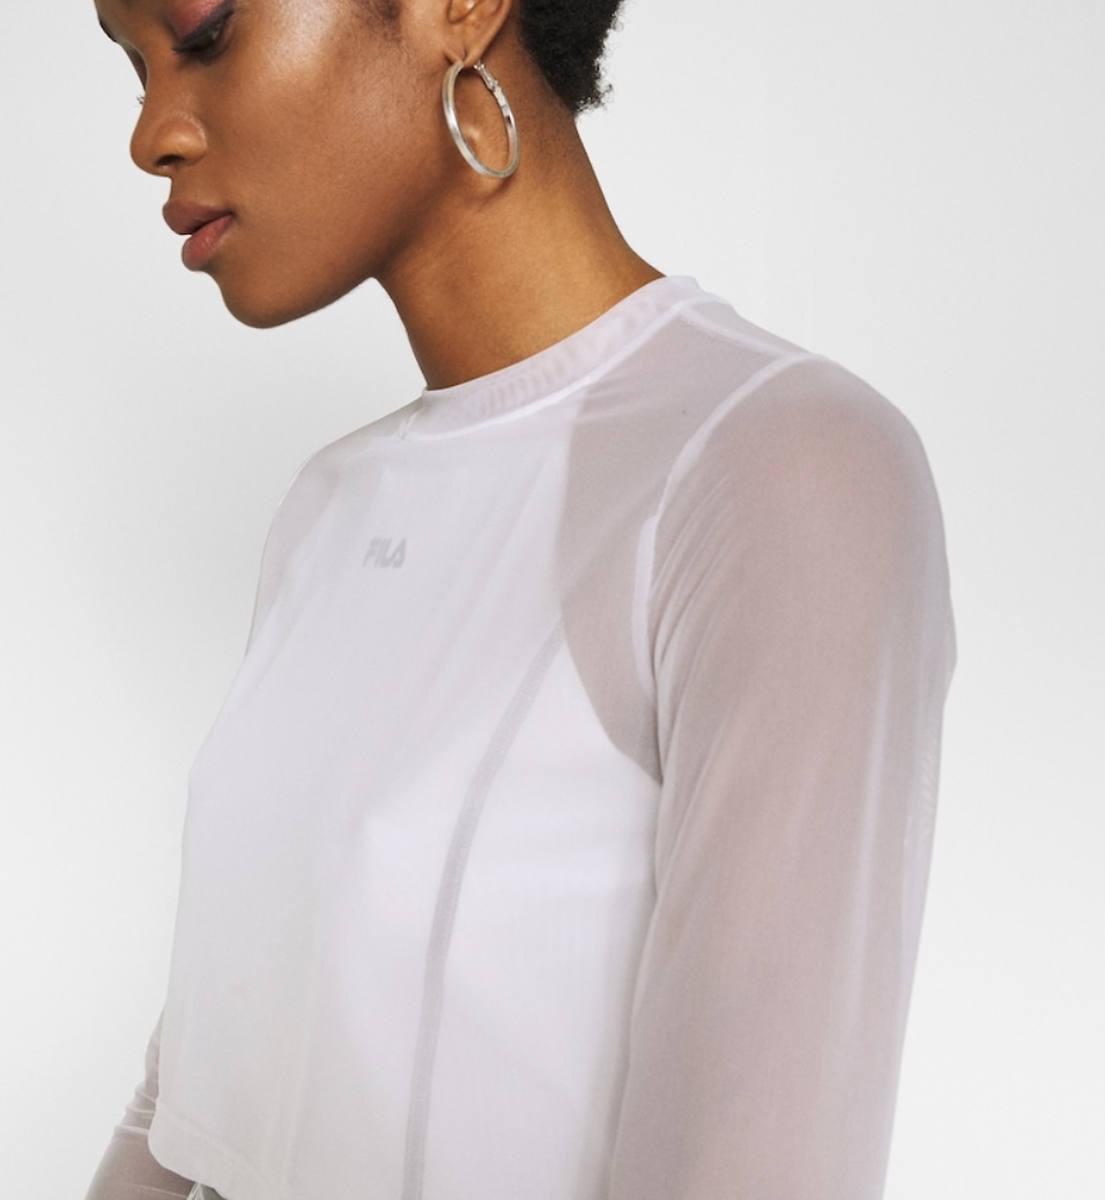 fila magenta t-shirt